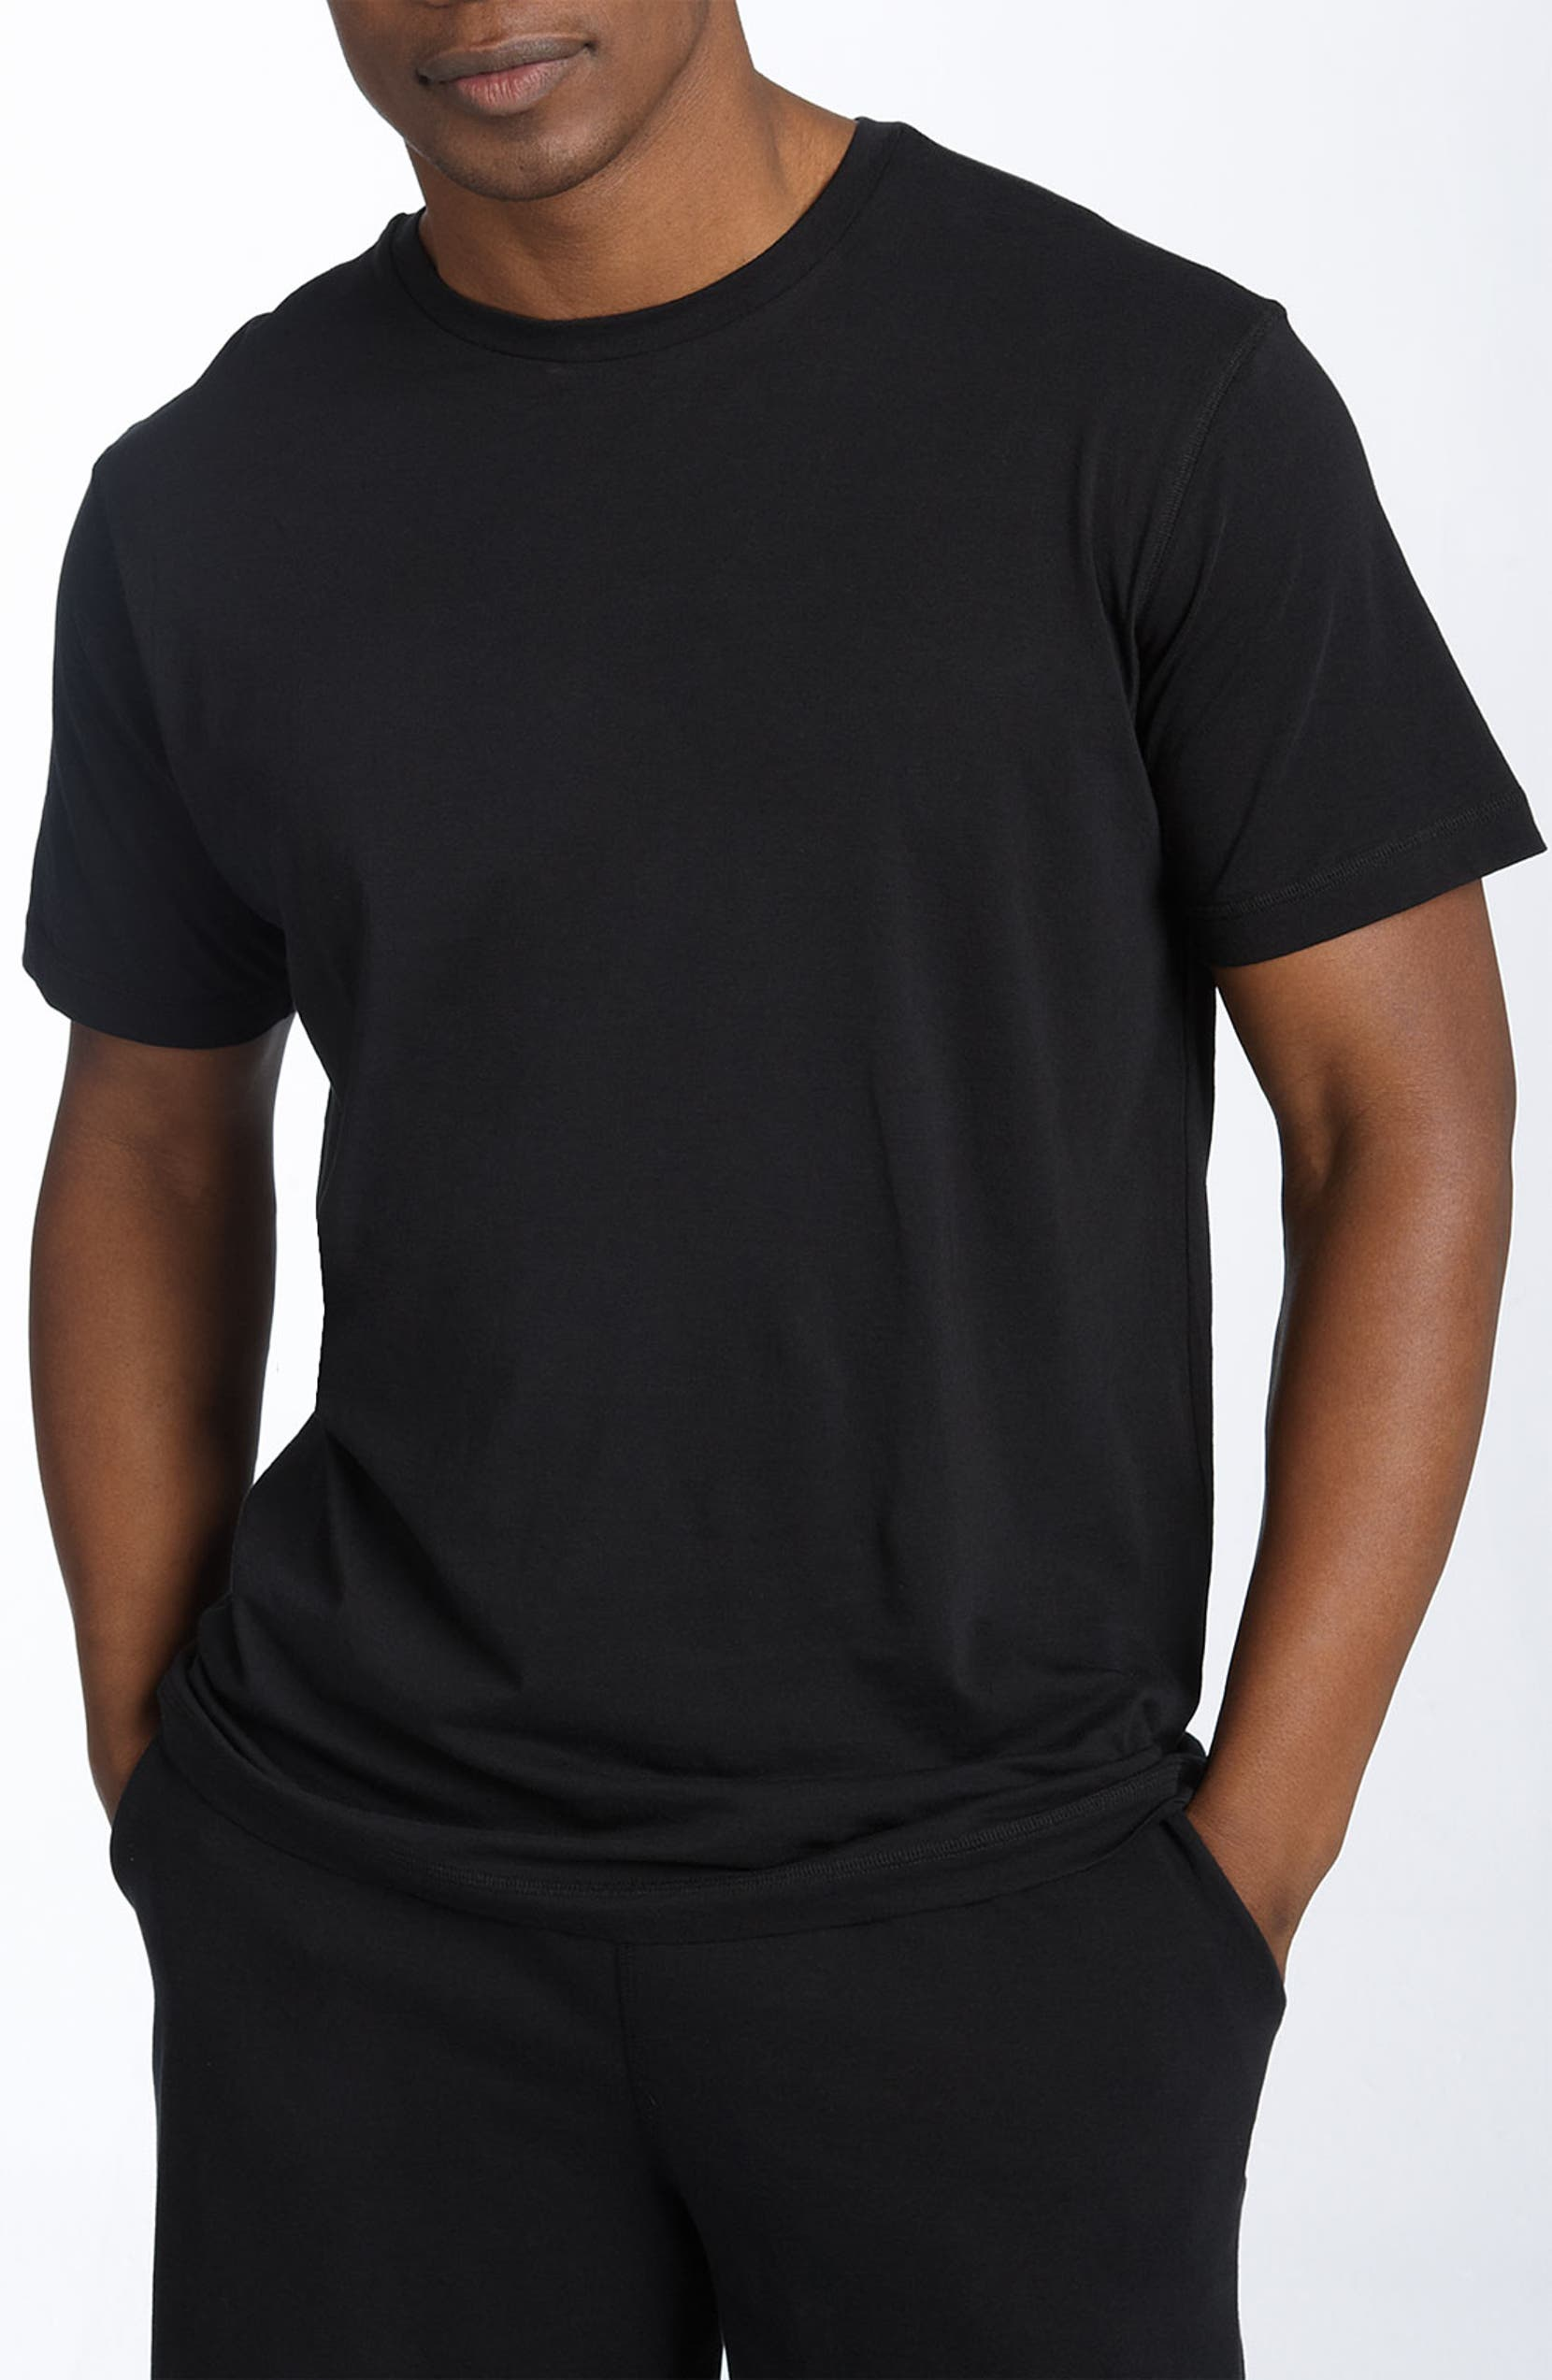 ef9bb450596d5 Daniel Buchler Peruvian Pima Cotton T-Shirt